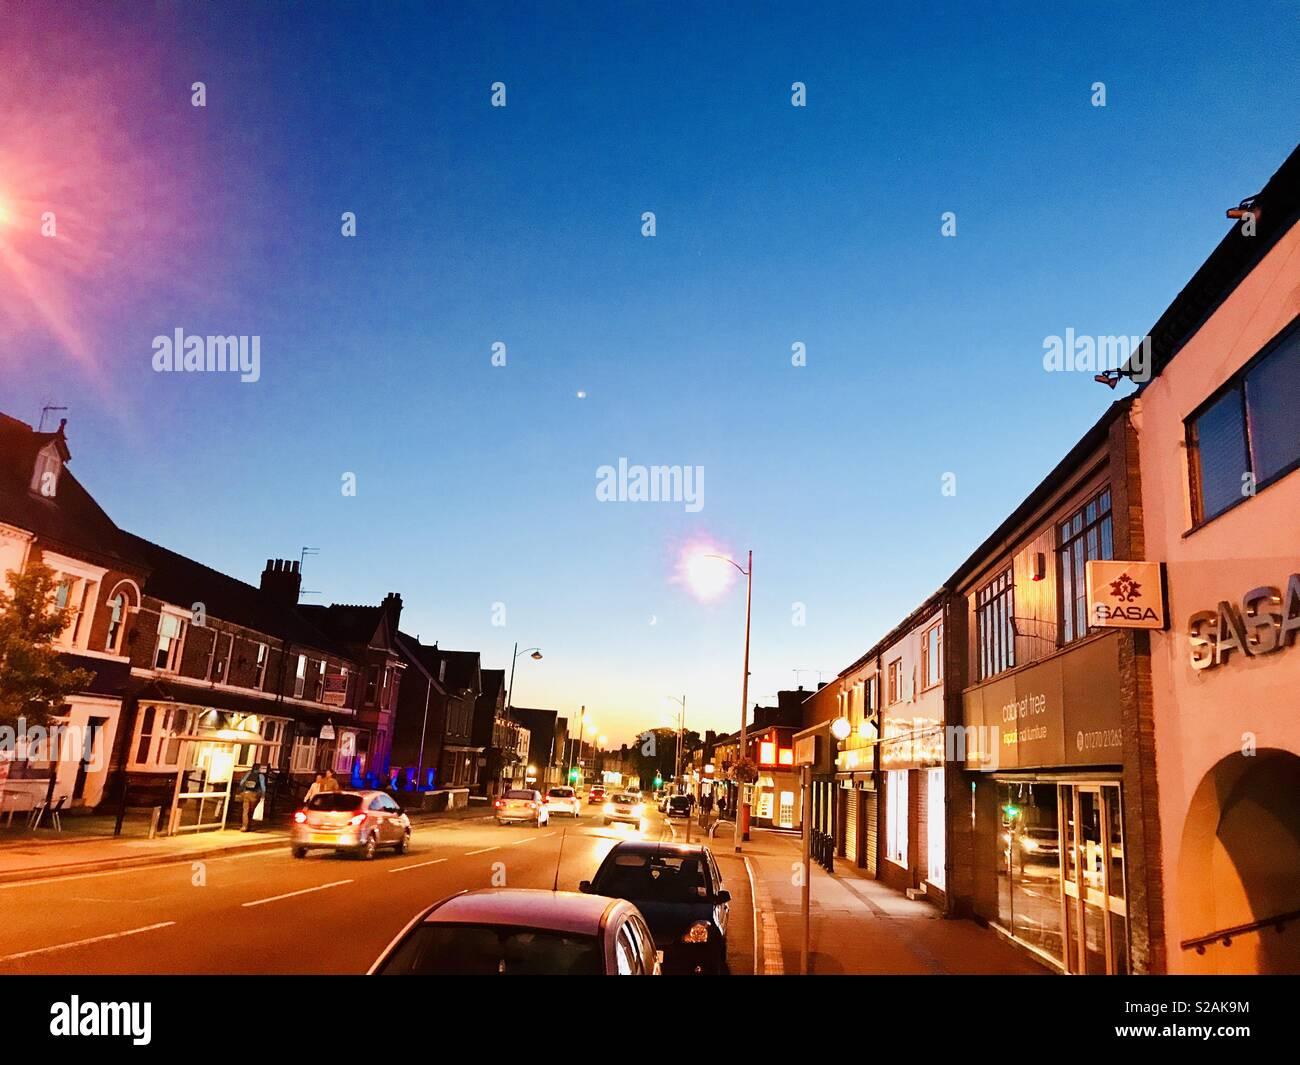 Nantwich road at night time, Crewe, Cheshire, U.K. - Stock Image